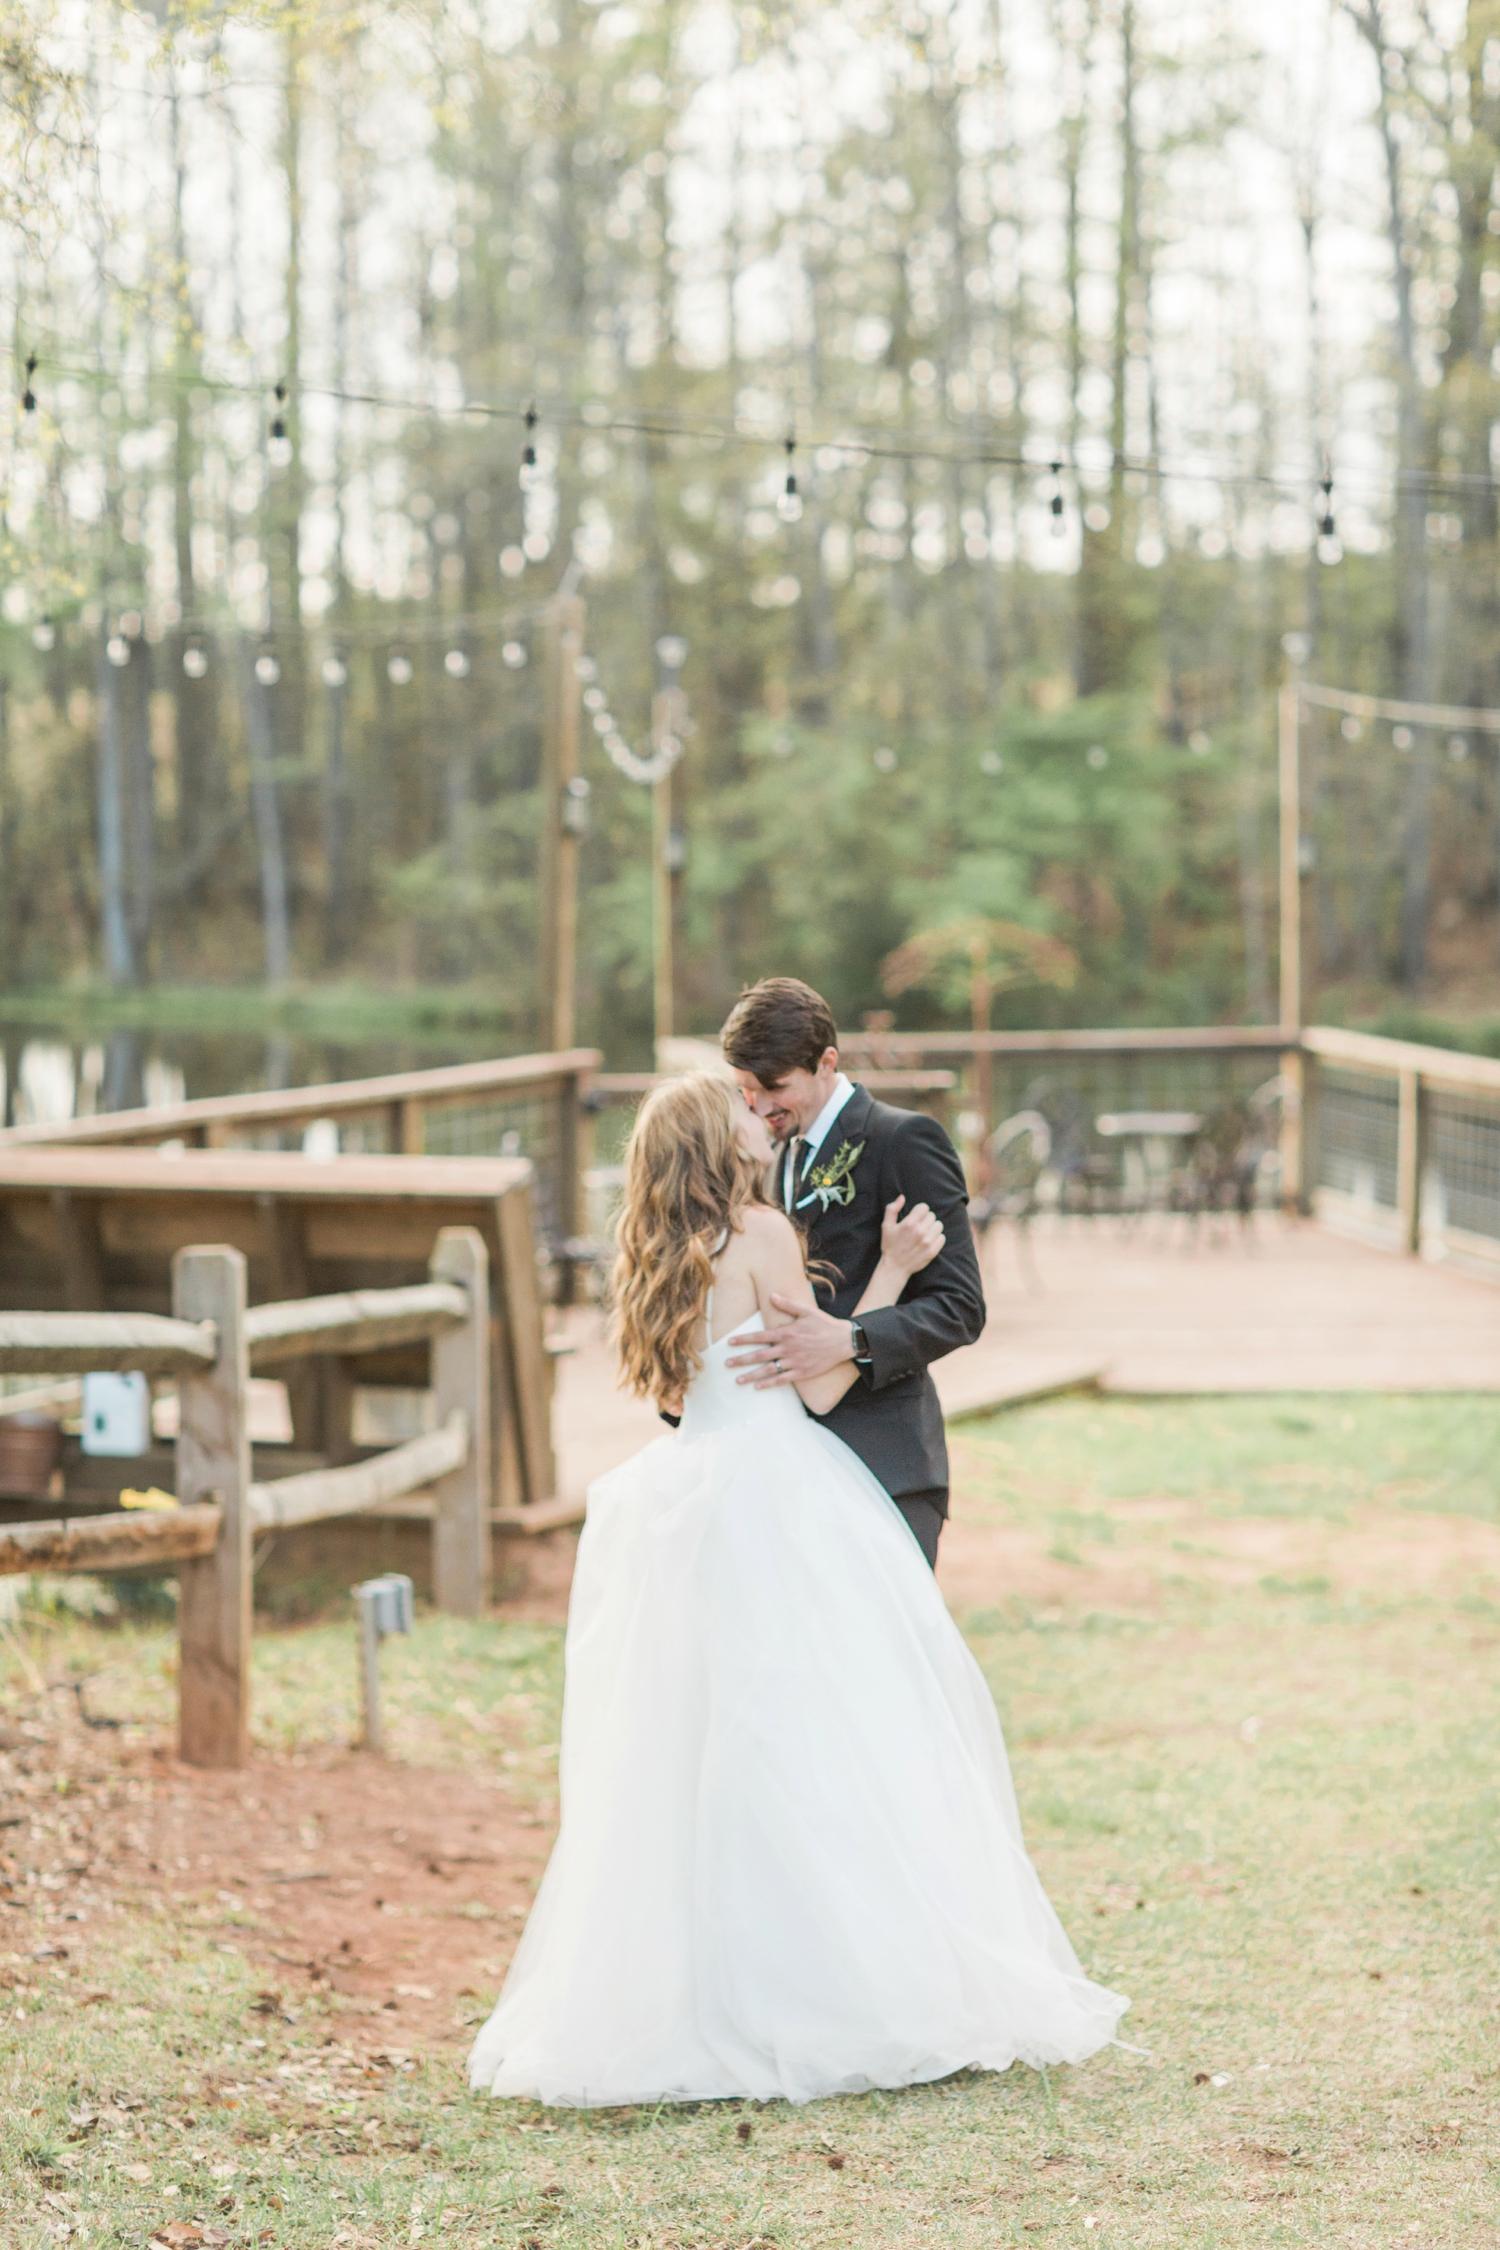 fine-art-film-charleston-south-carolina-wedding-photographer-atlanta-georgia_3487.jpg